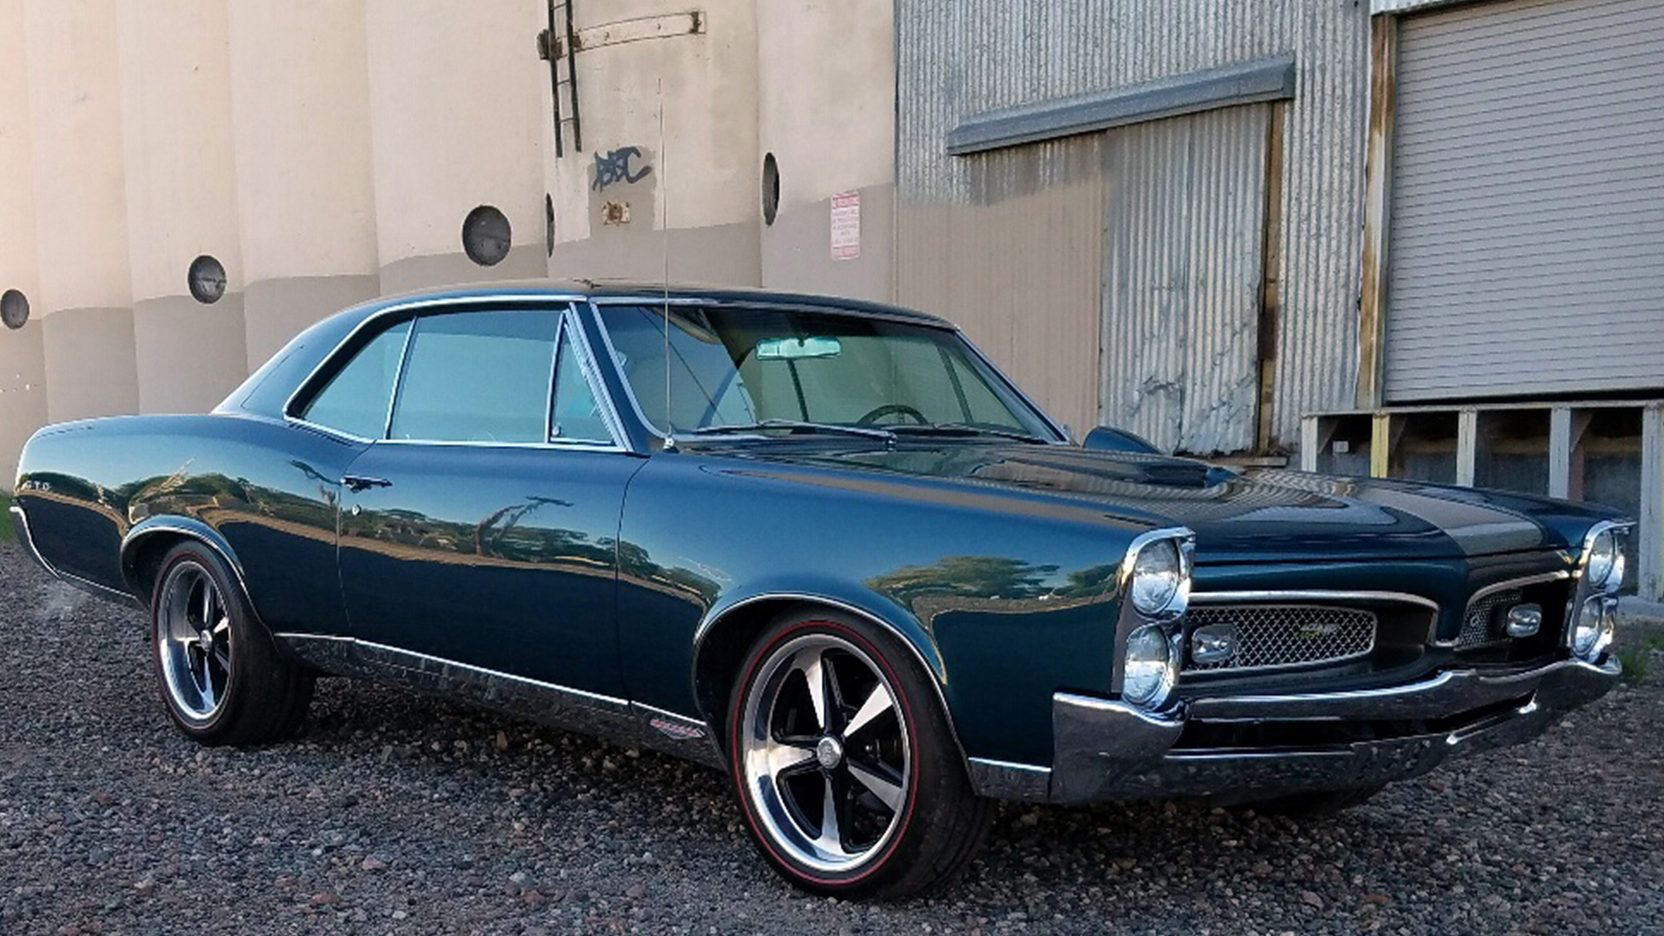 1967 Pontiac GTO | Classic Cars | Pinterest | Cars, Gto car and Hot cars